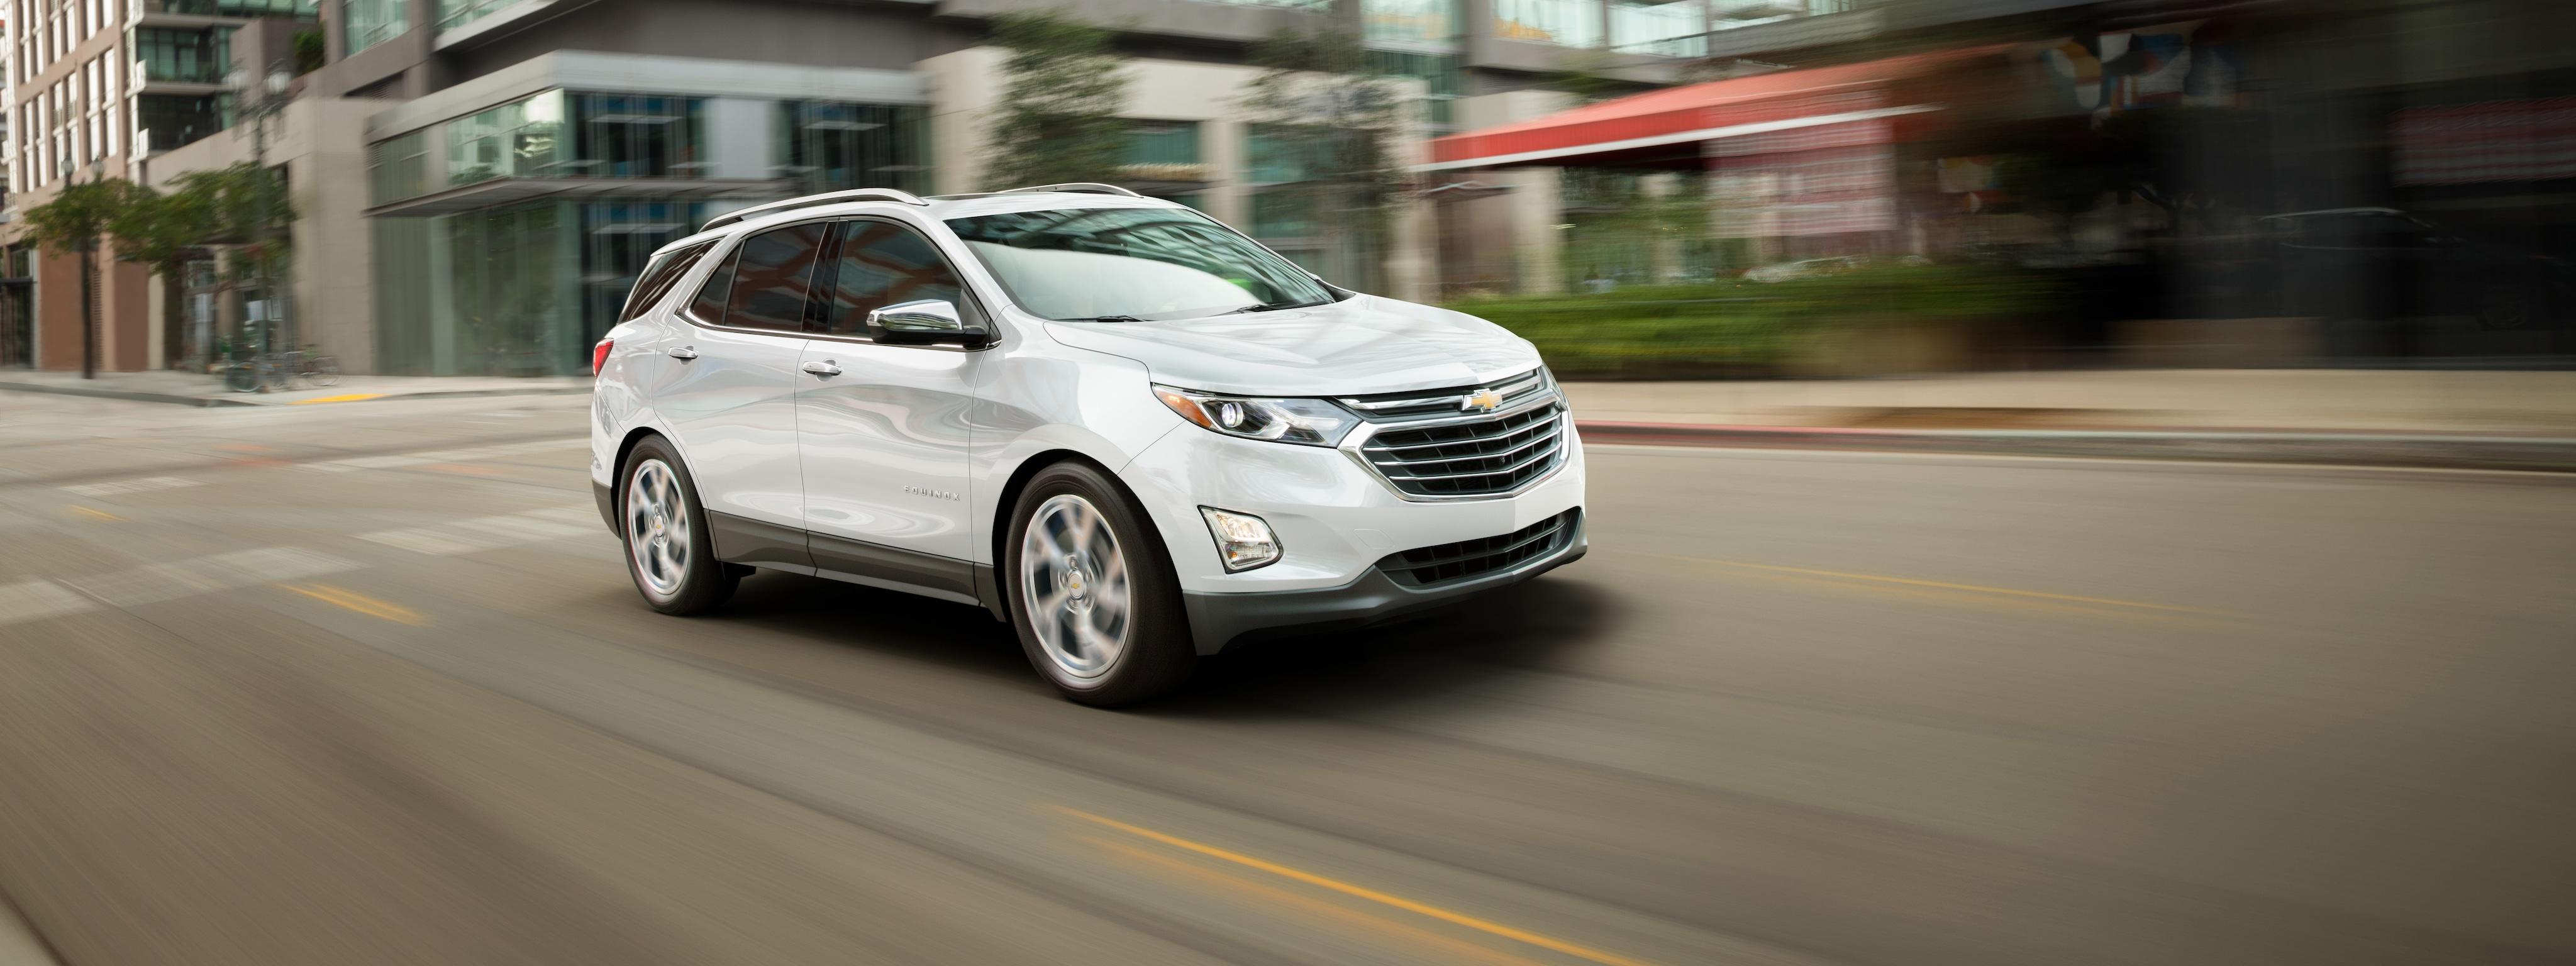 Auto Finance Center Woodbridge Va >> Malloy Auto Group New Cadillac Toyota Chevrolet